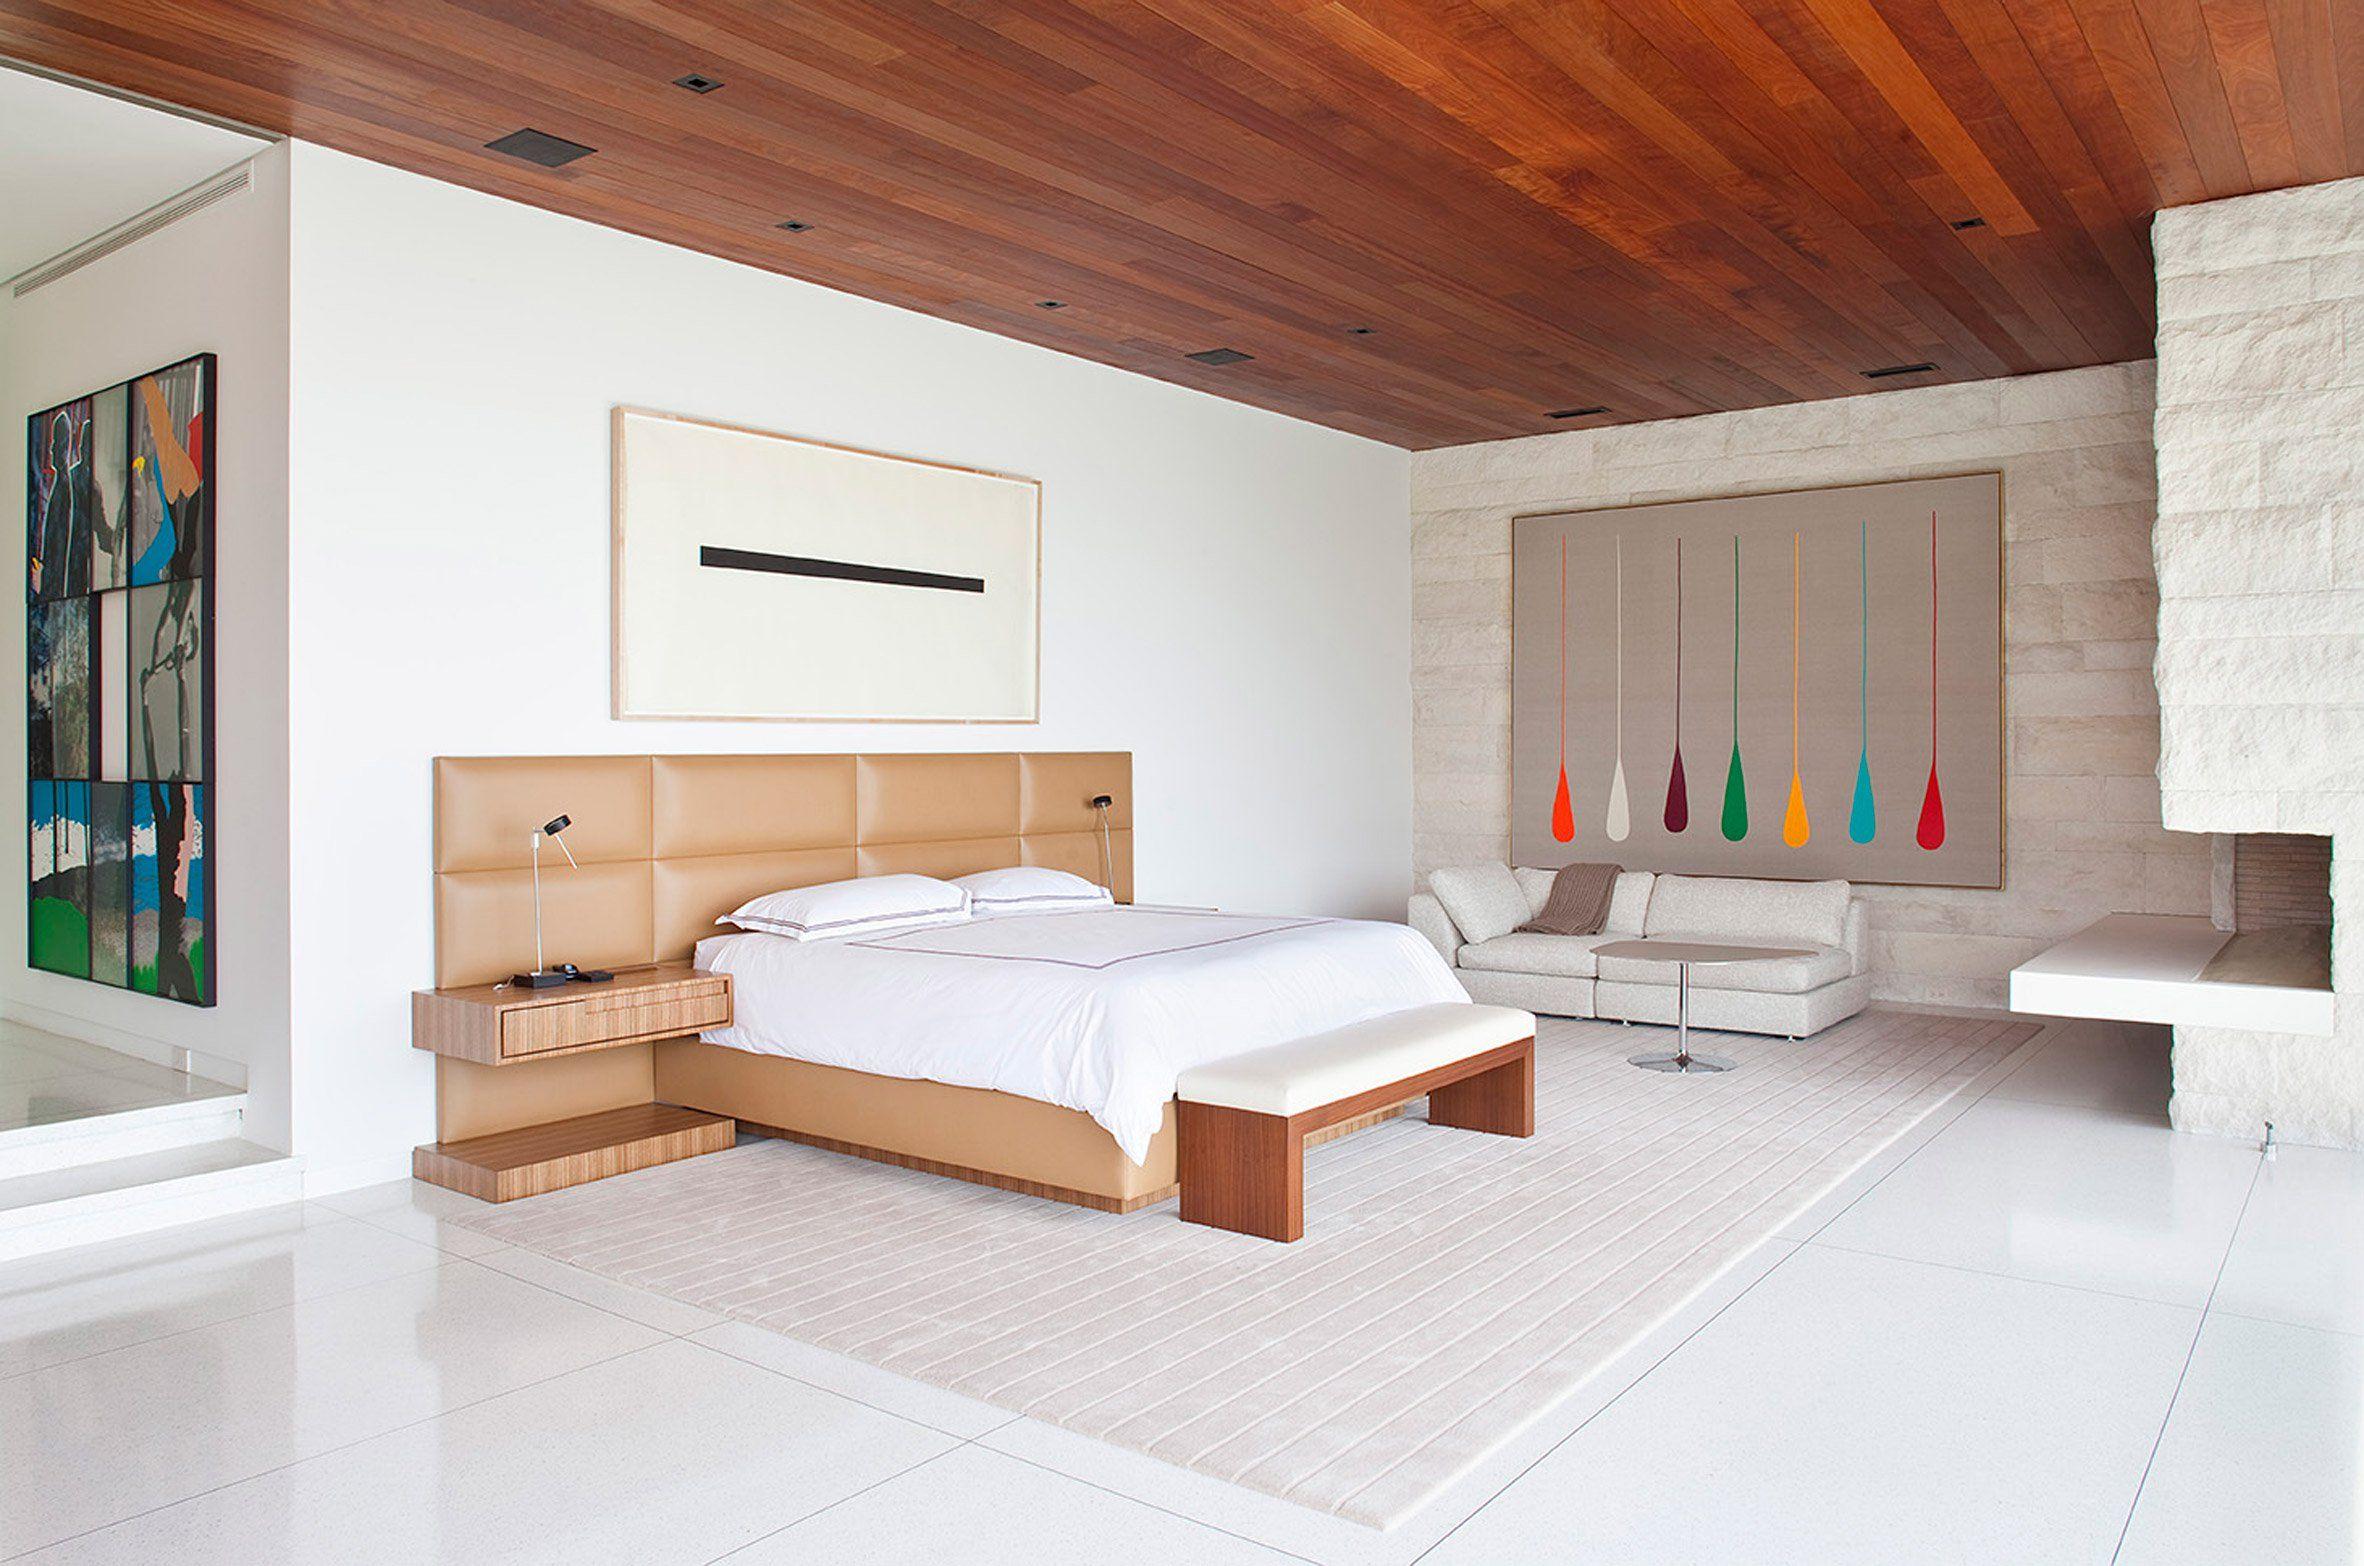 Studio William Hefner completes Beverly Hills house